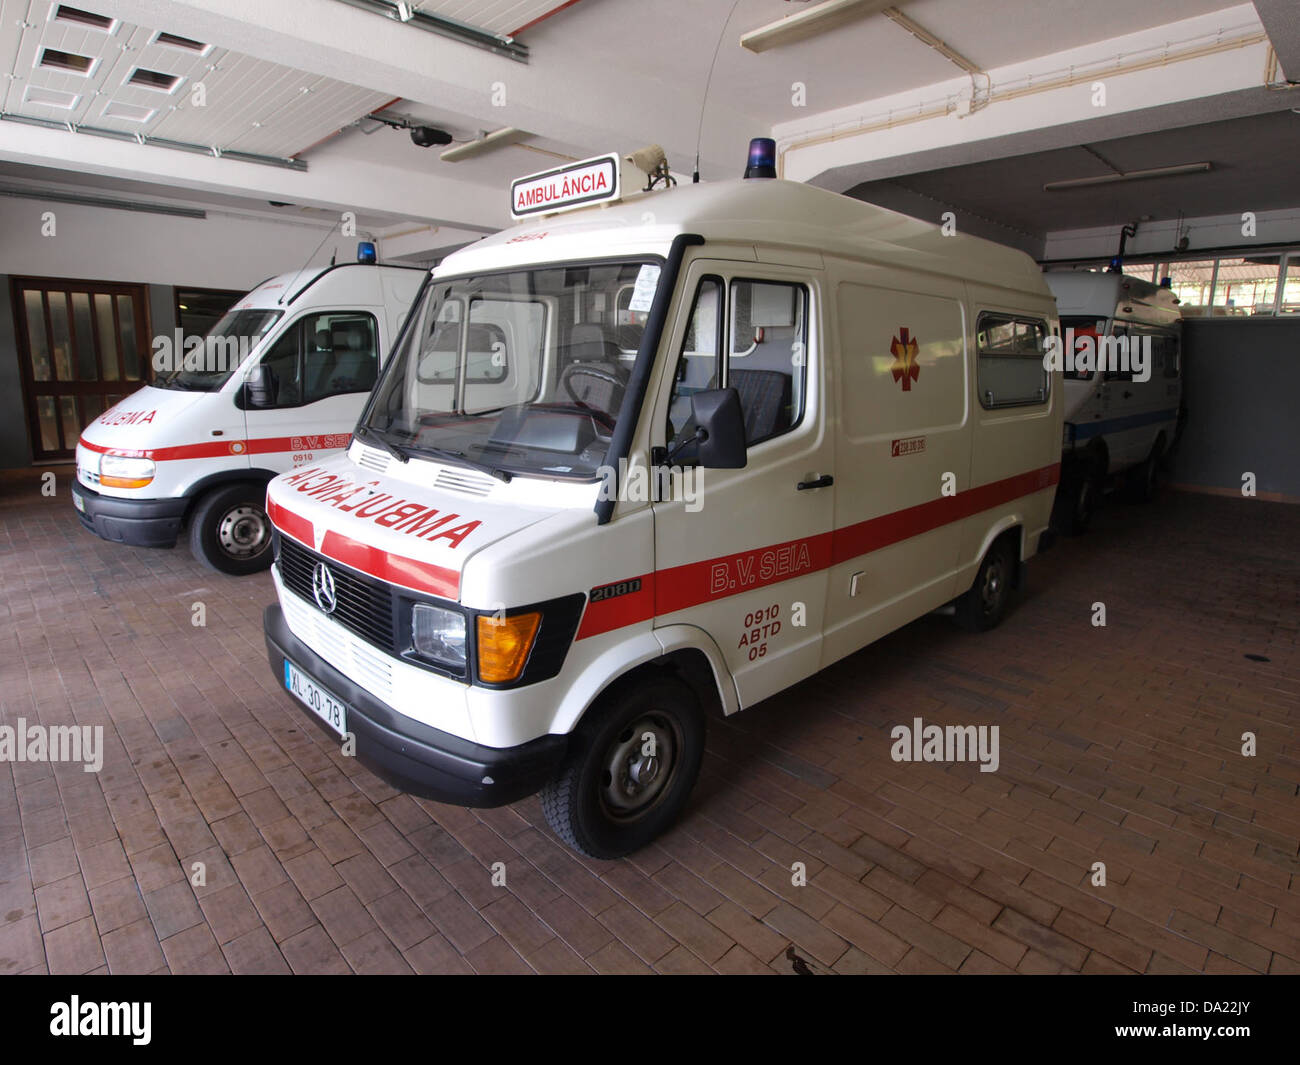 Mercedes ambulance, Bombeiros Seia, Unit 0910 ABTD 0 - Stock Image